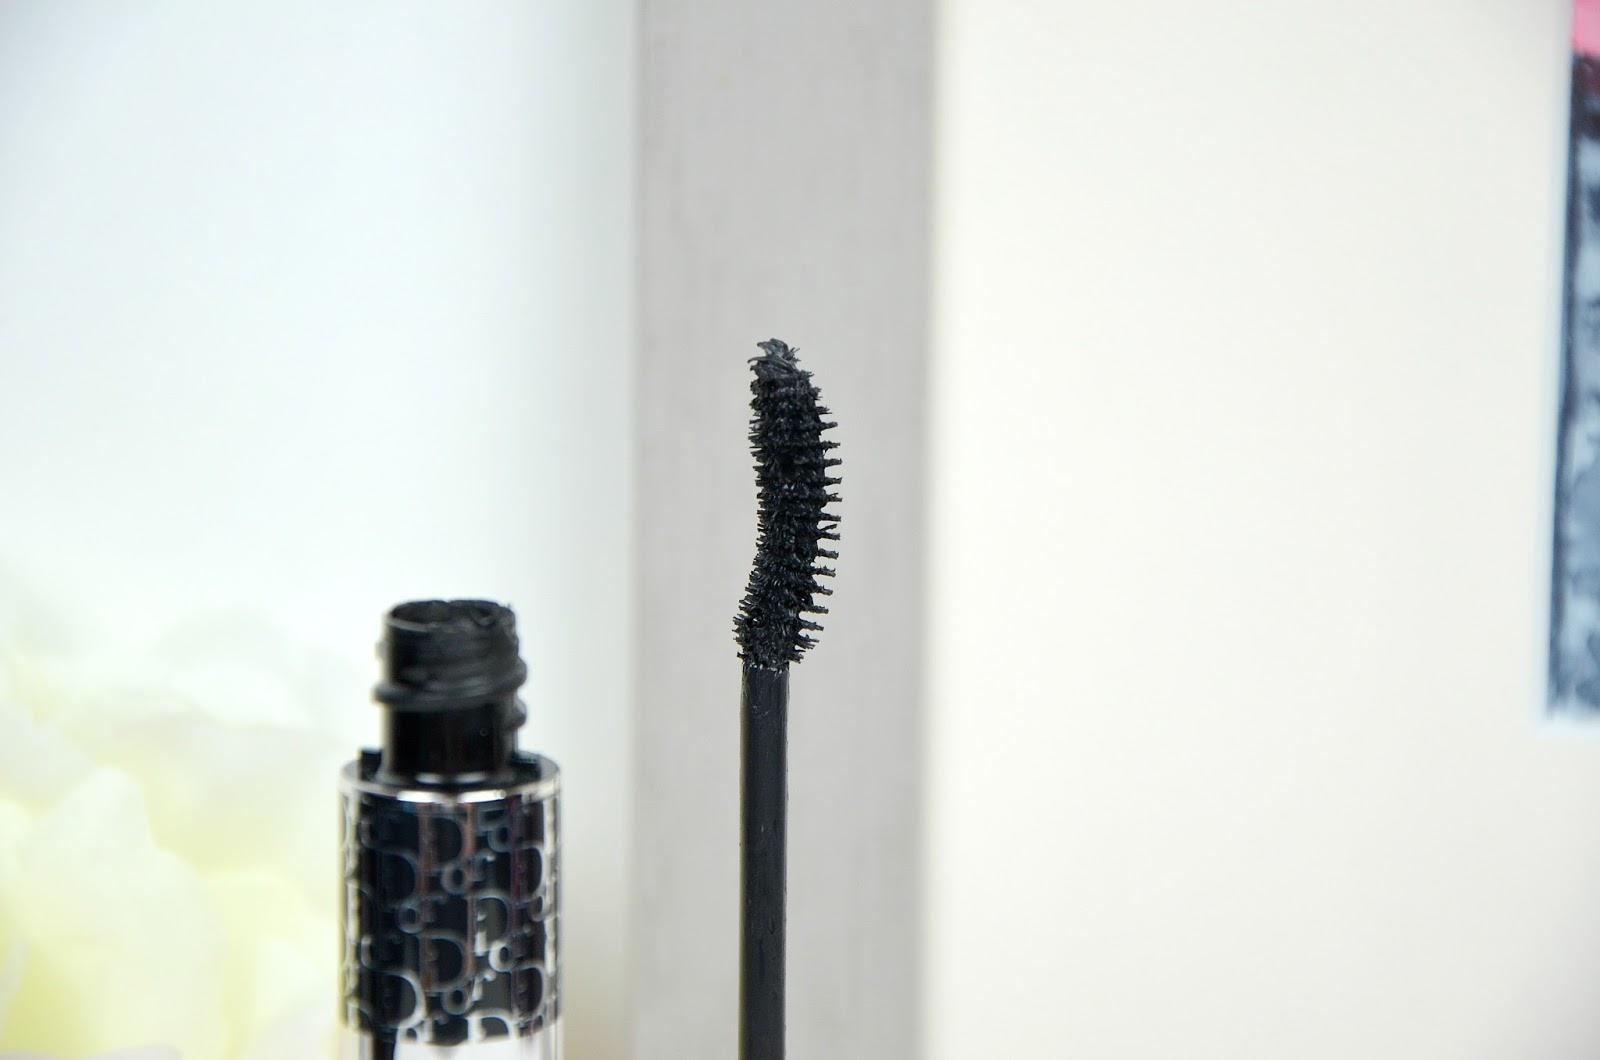 diorshow iconic overcurl mascara dior zoom brosse